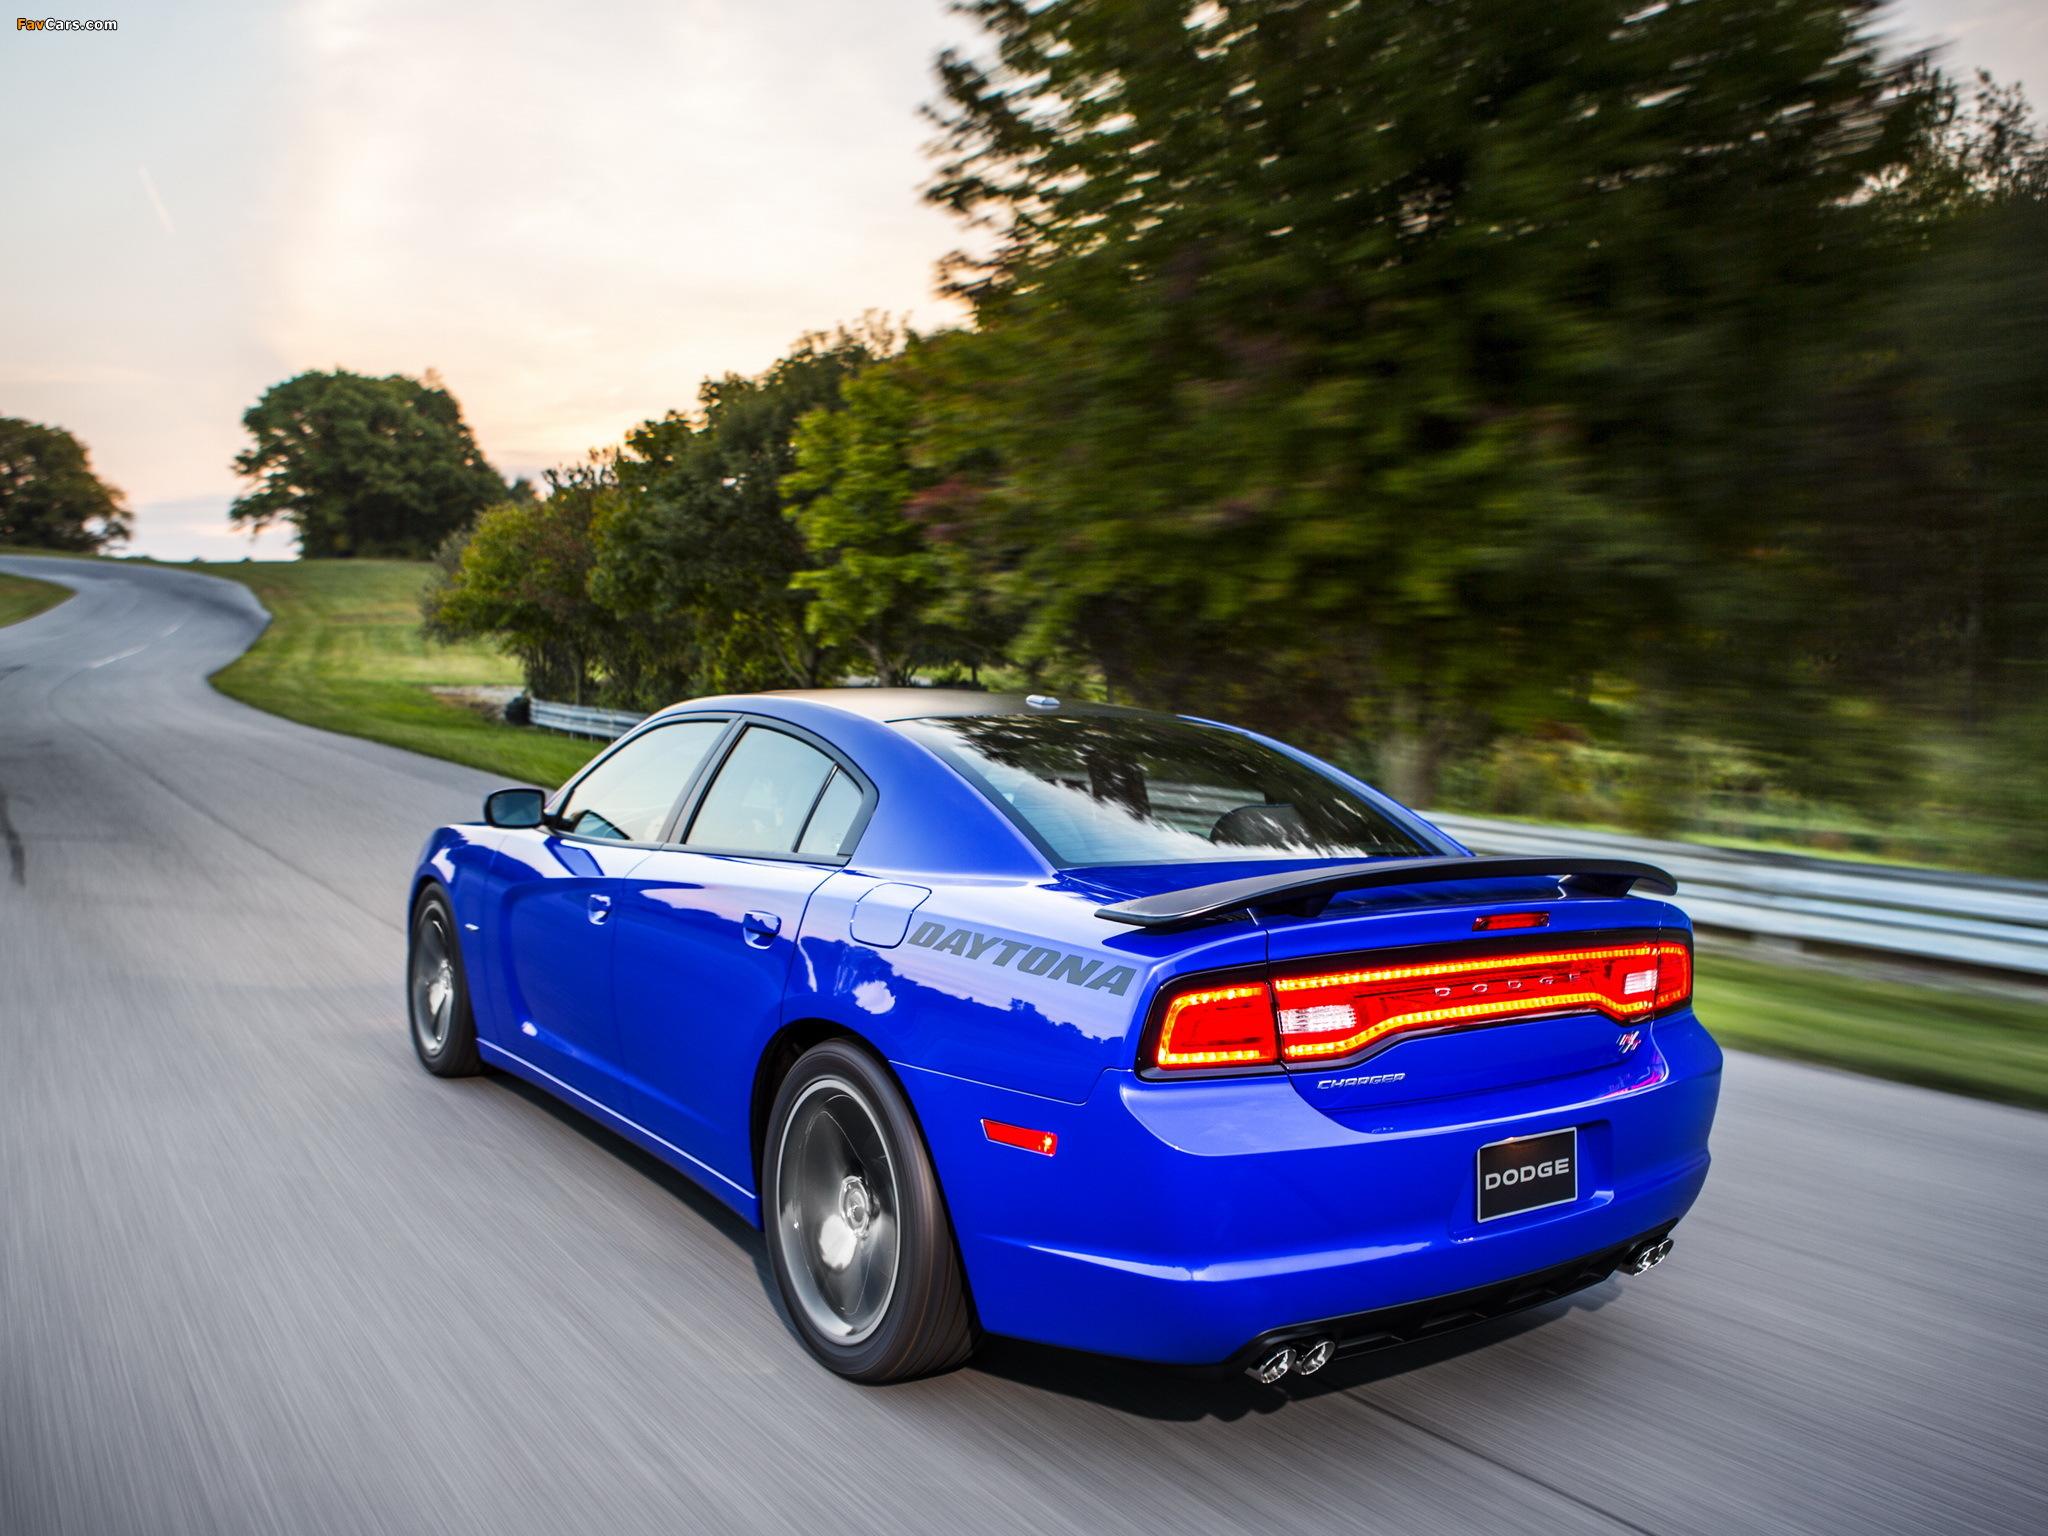 Dodge Charger R/T Daytona 2013 photos (2048 x 1536)